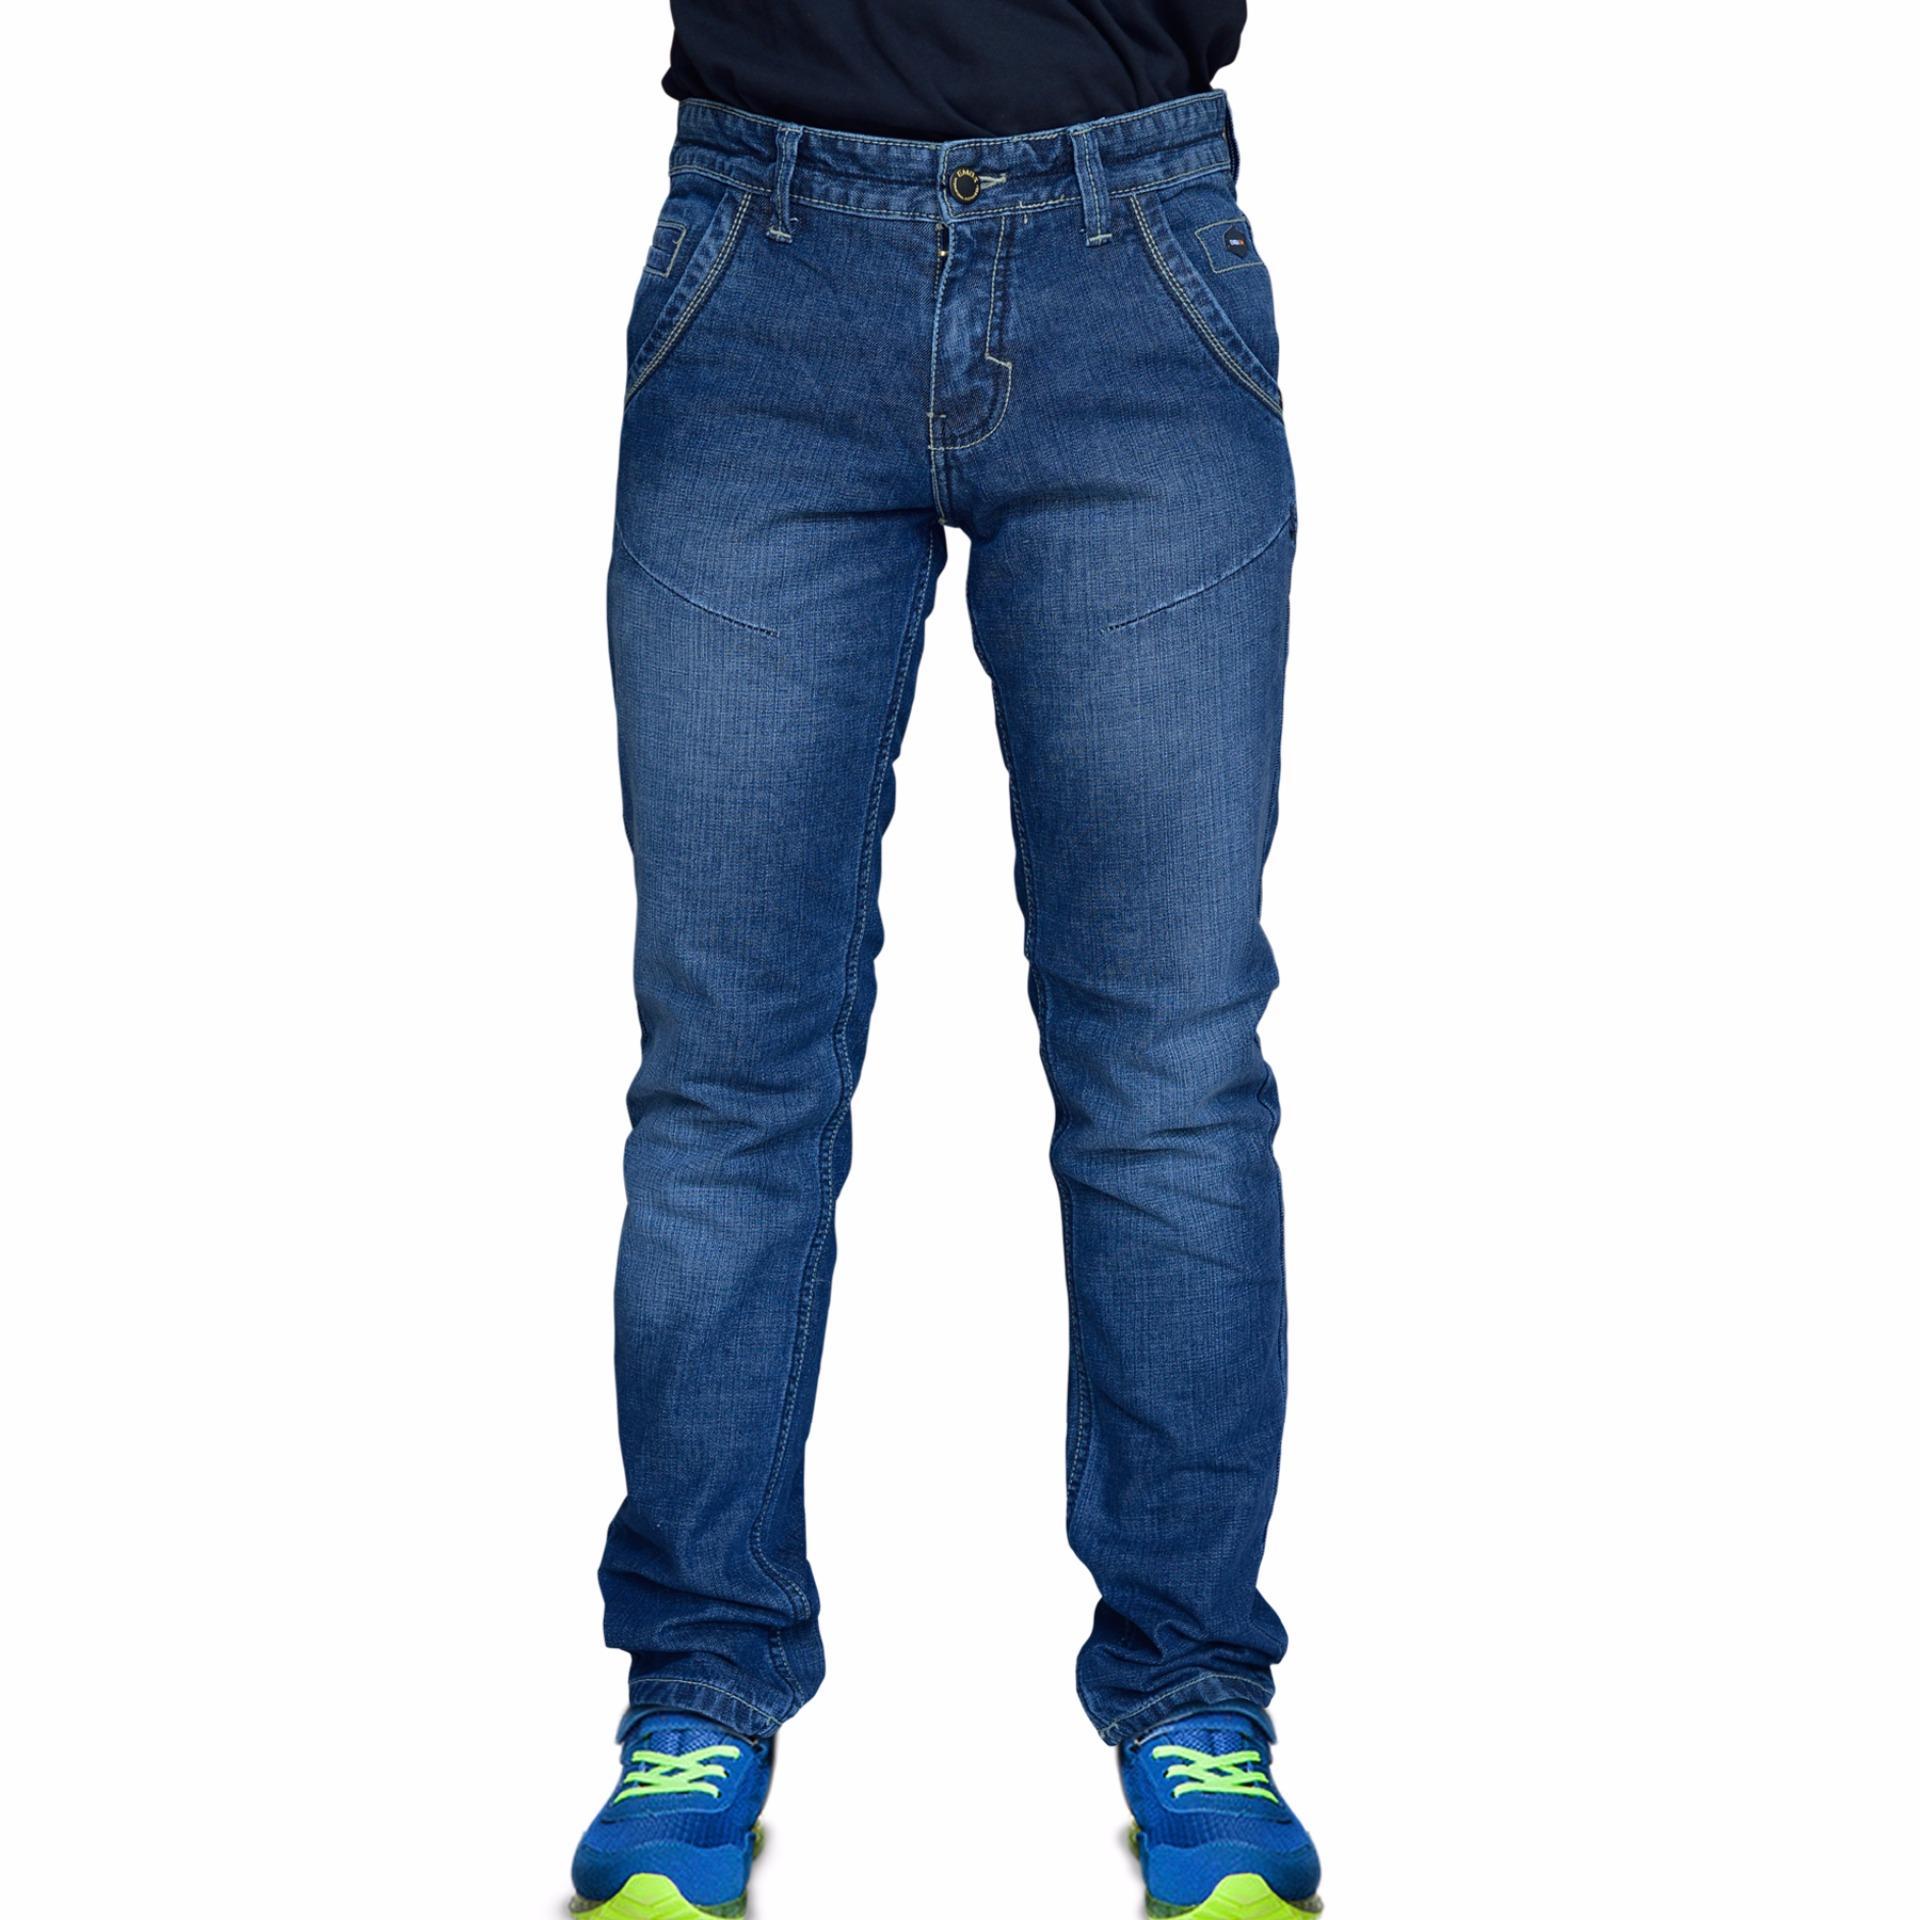 Emba Jeans Celana Panjang Pria Bs 08 Jordan Regular Charcoal Bs08b1 Denim Warna Jet Black Hitam 38 Rodensi One 613 10138 20